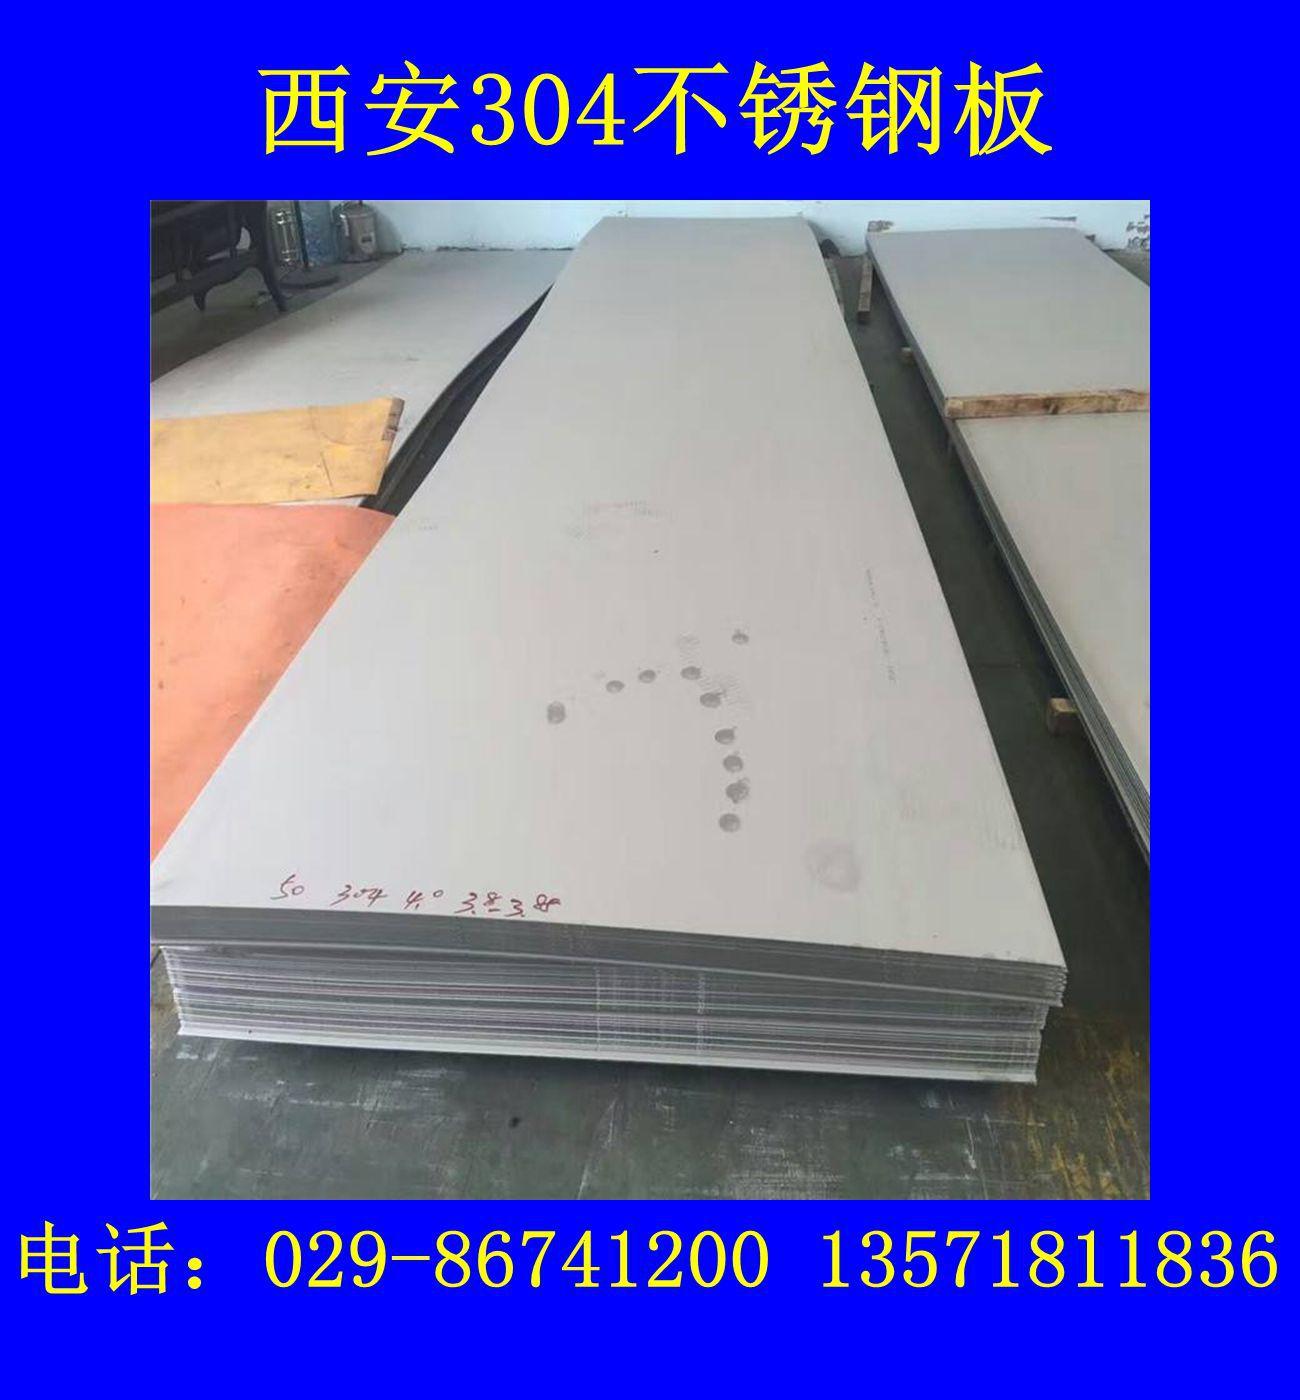 塔城不銹鋼板304不銹鋼板316不銹鋼板321不銹鋼板廠家直銷